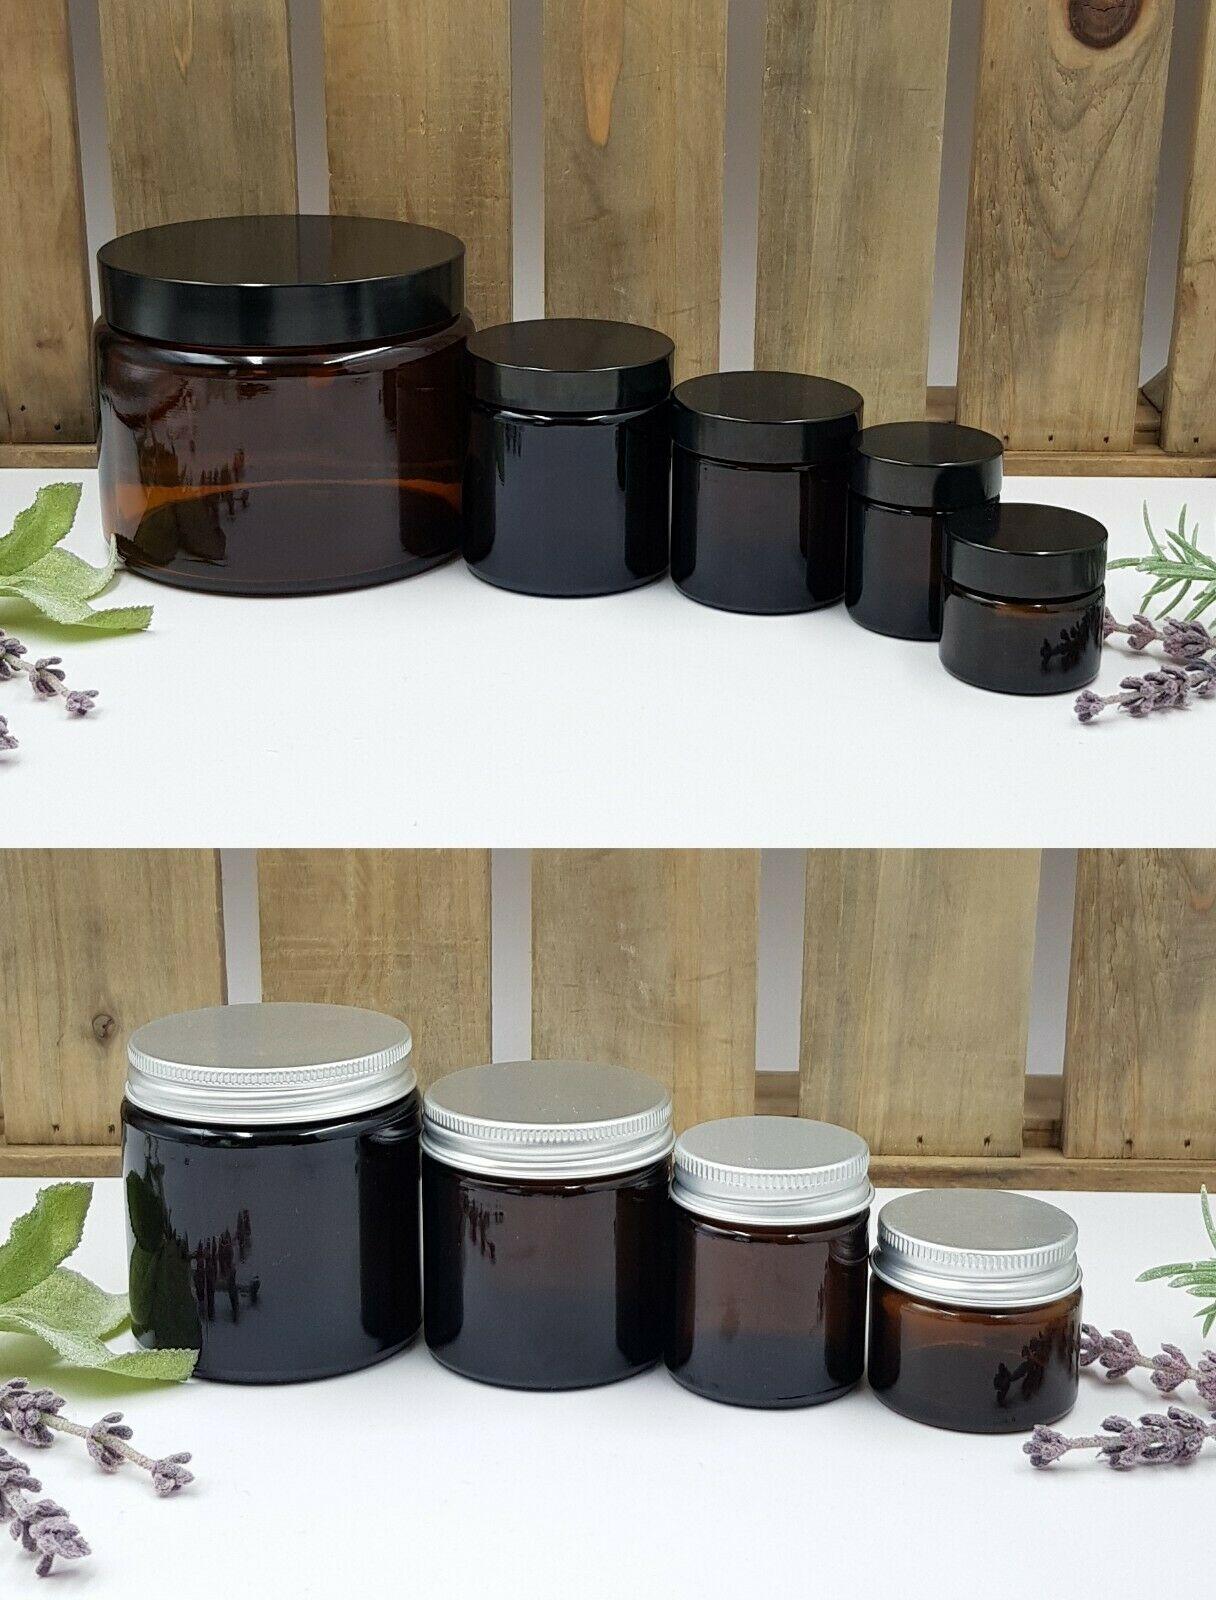 Glass Jars (Creams & Candles)